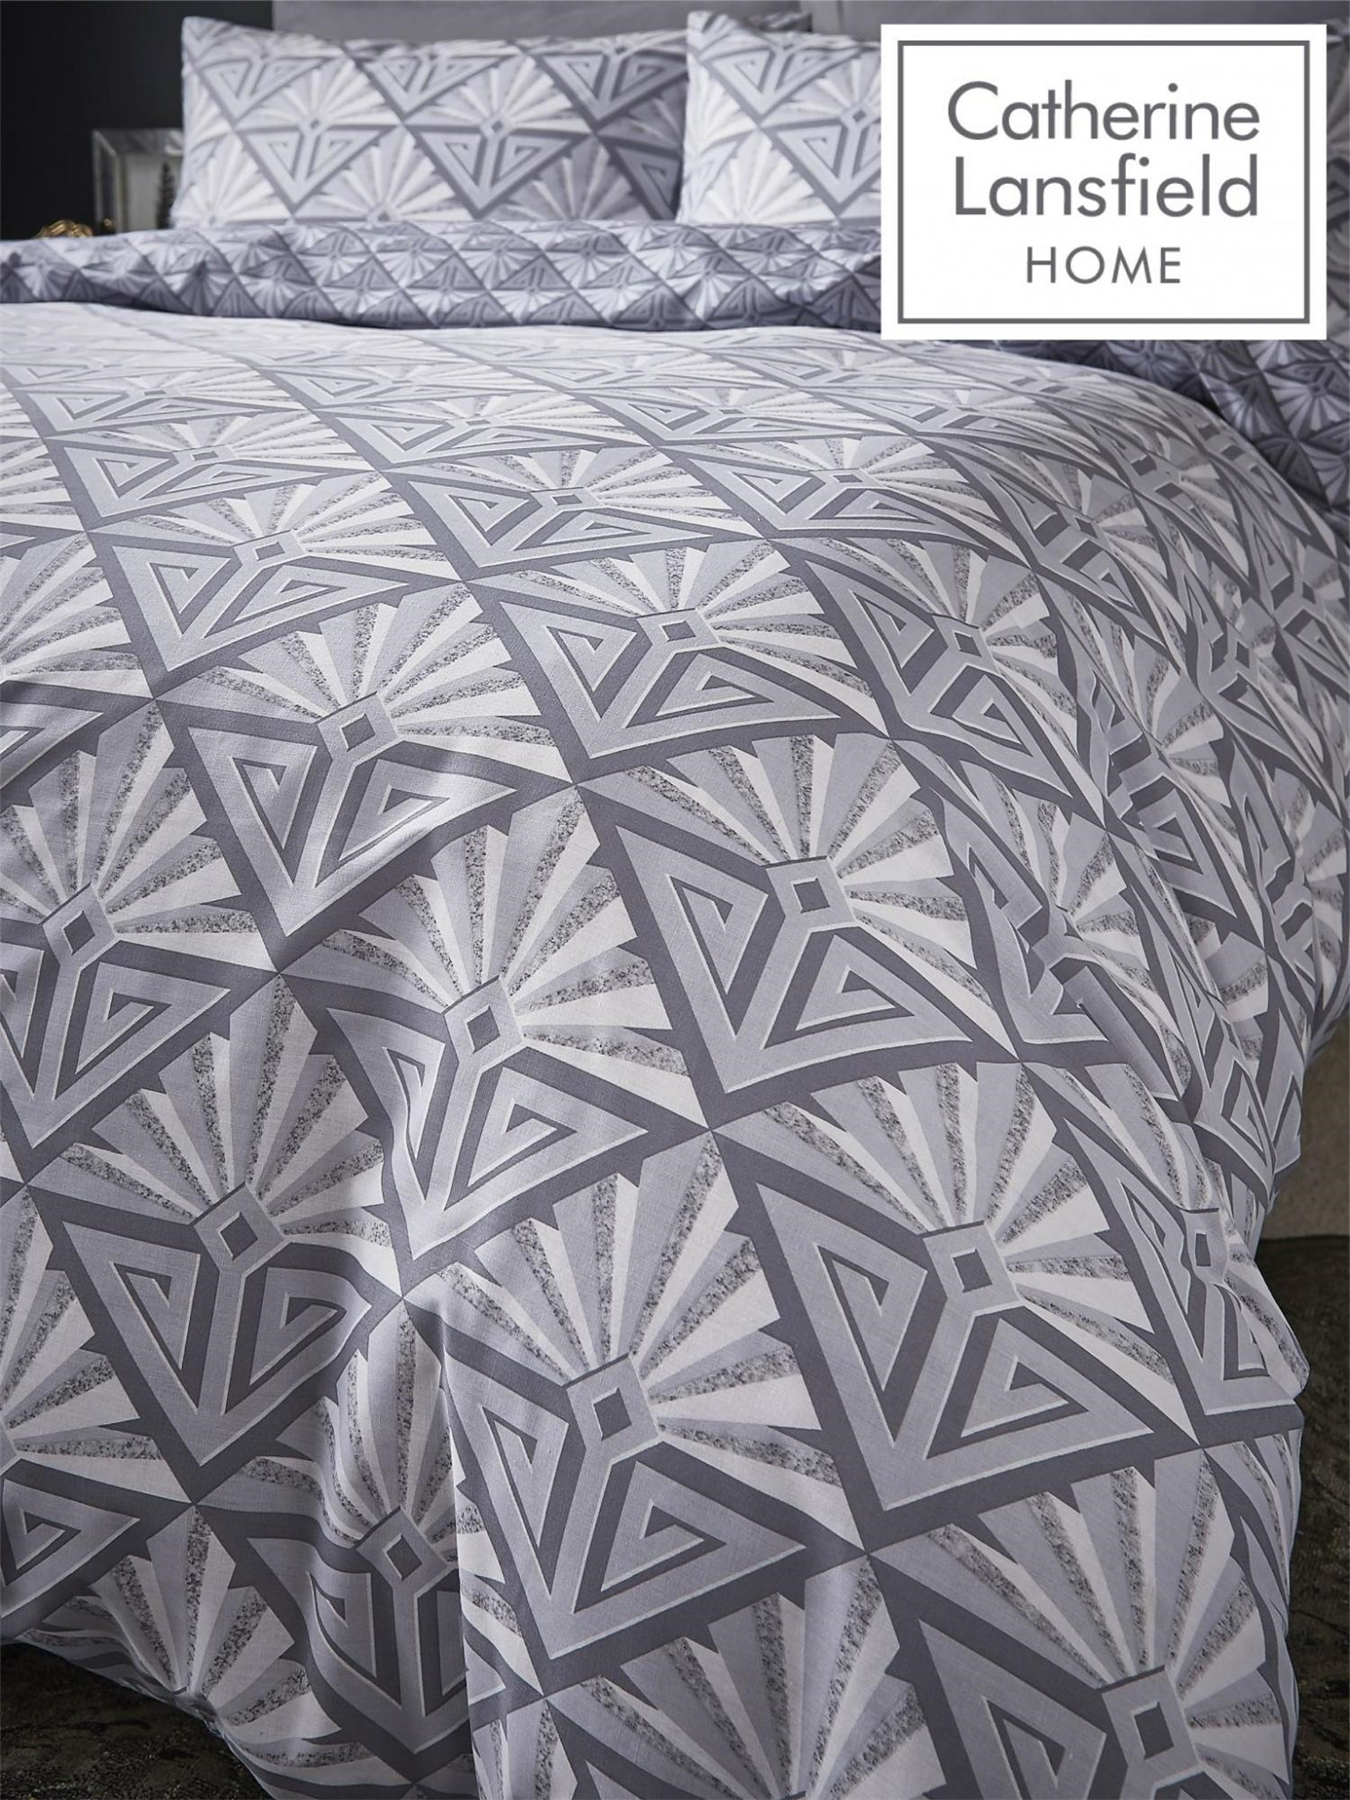 Catherine-Lansfield-Duvet-Set-Reversible-Art-Deco-Grey-Bedding-Pillows-Curtains thumbnail 10